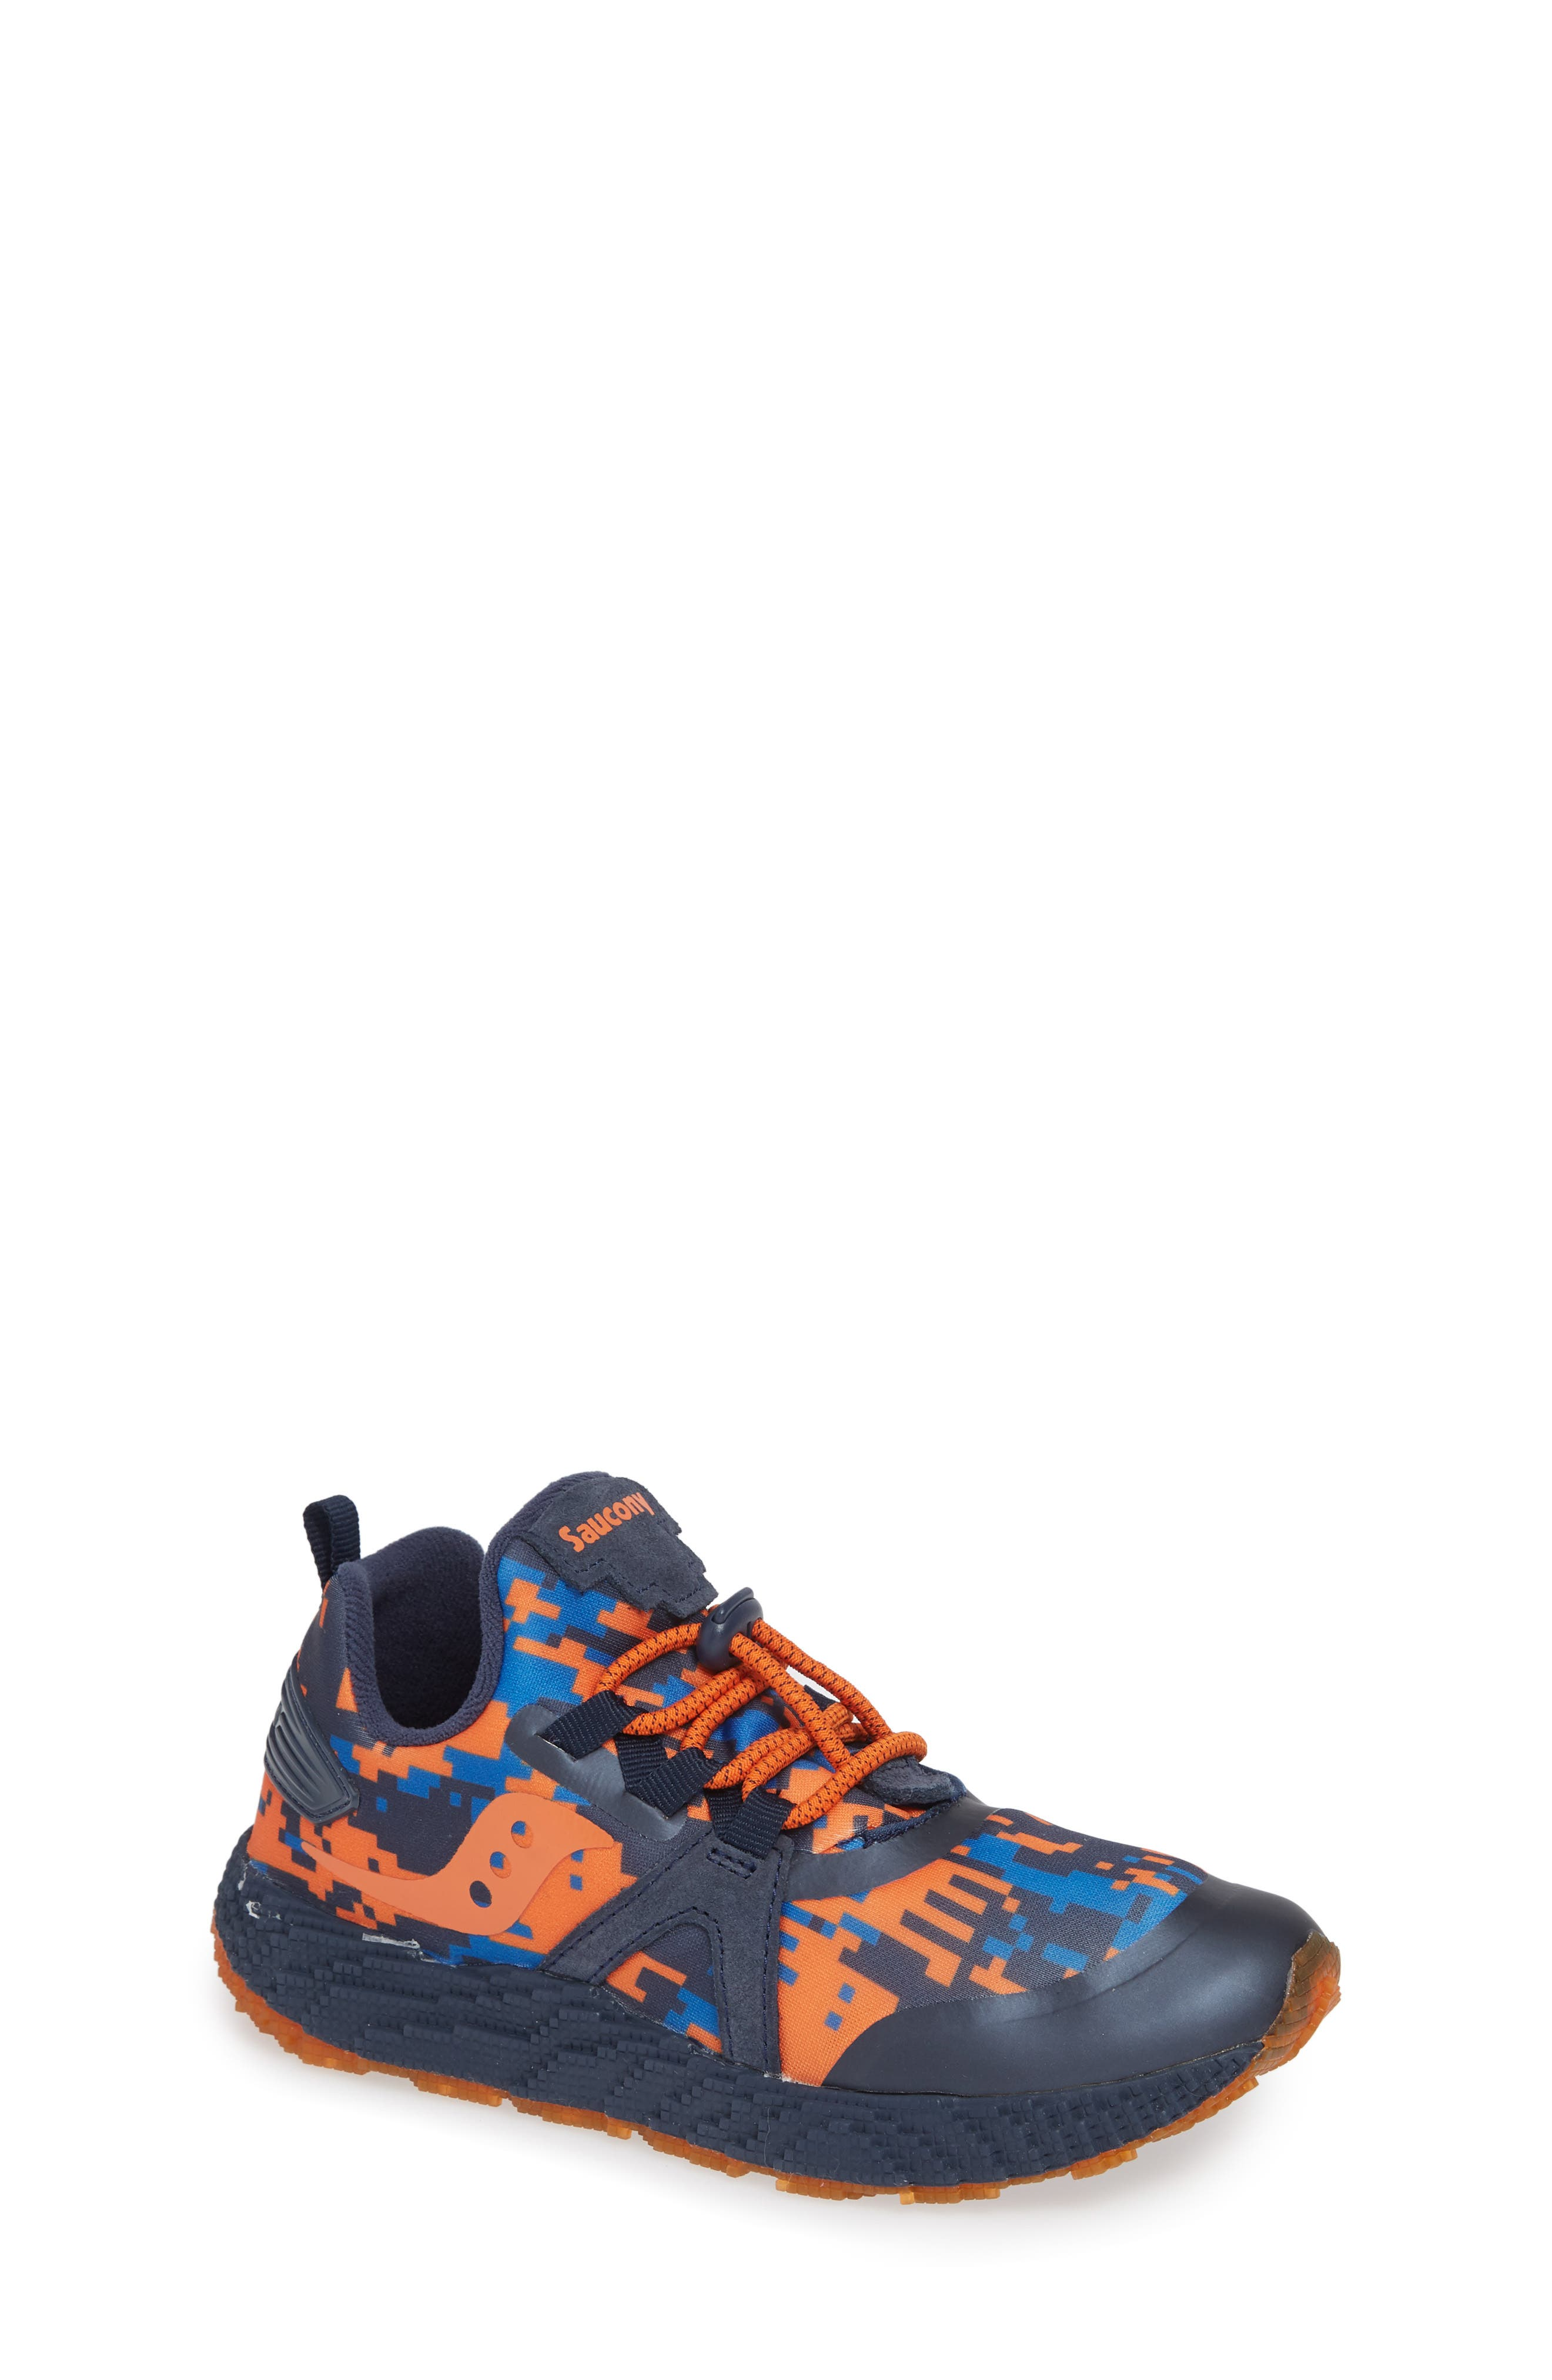 SAUCONY, Voxel 9000 Sneaker, Main thumbnail 1, color, BLUE LEATHER/ MESH